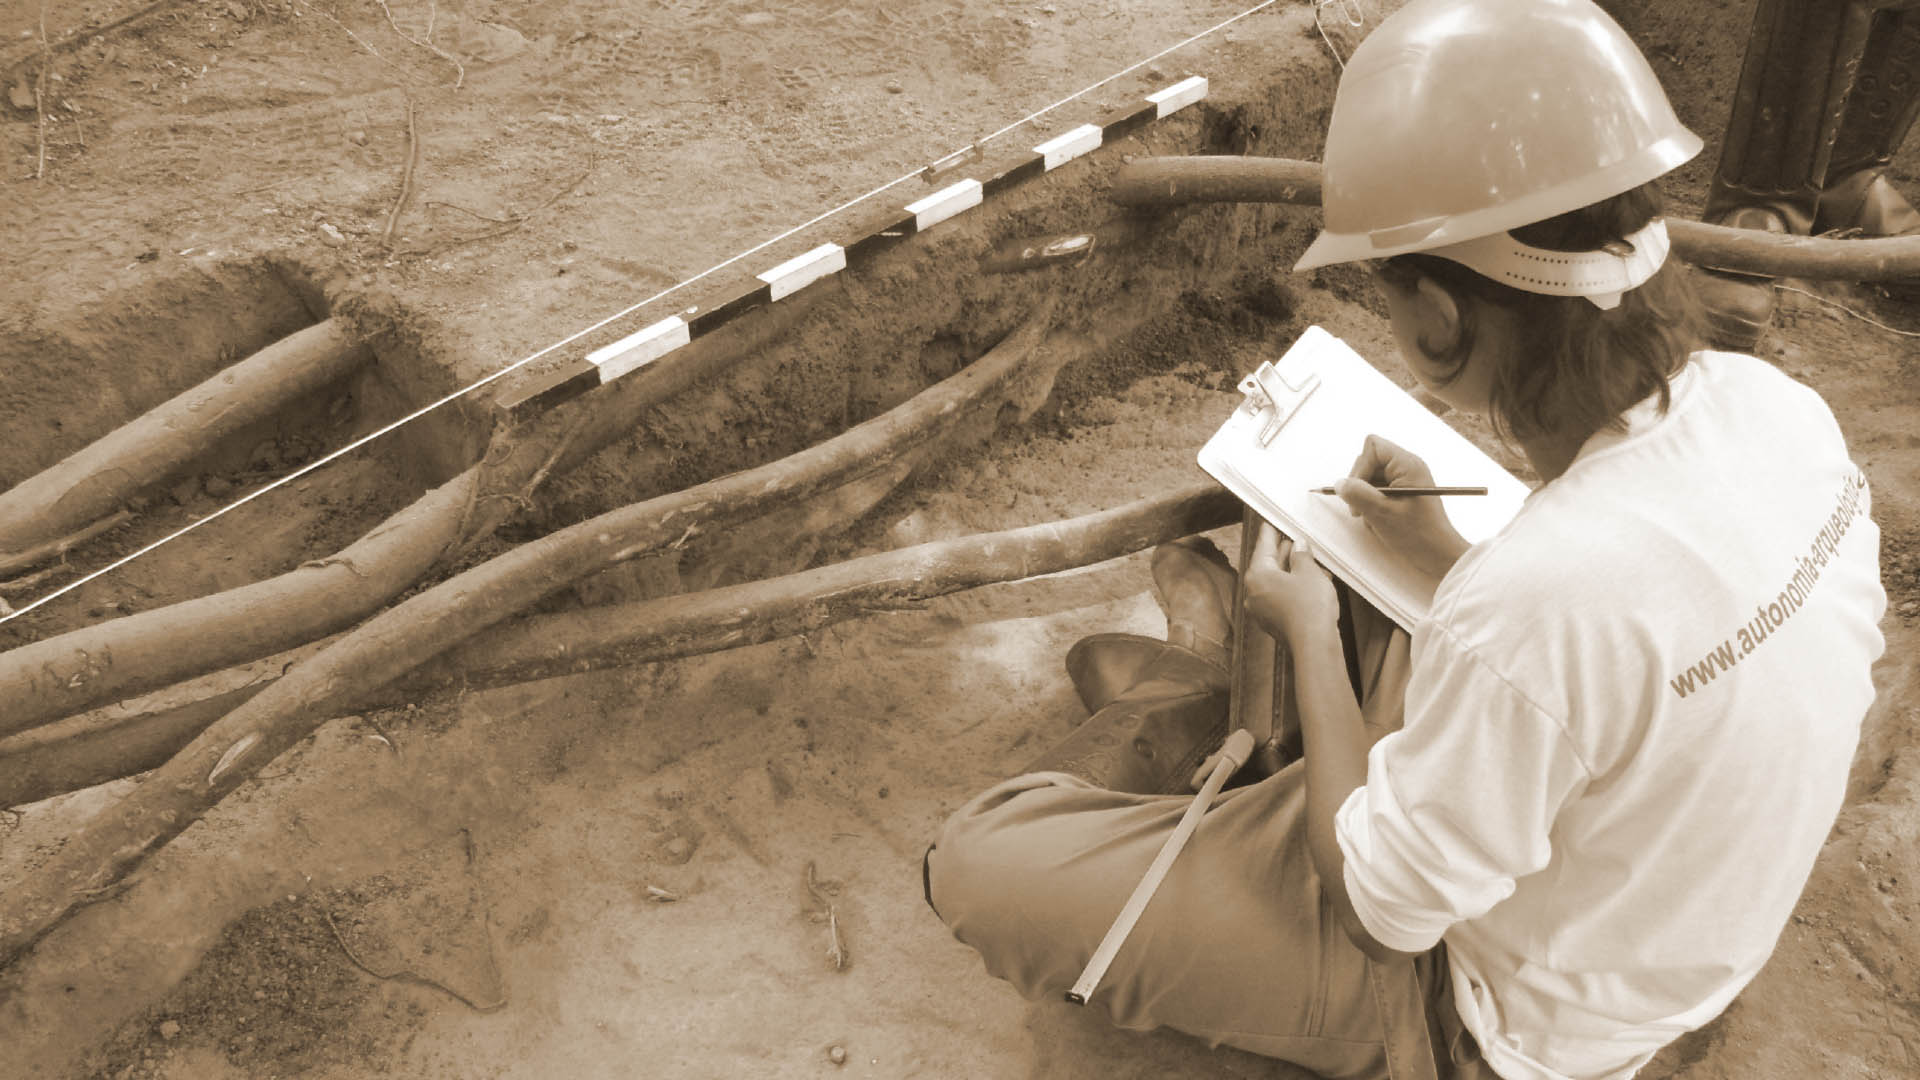 Autonomia Arqueologia - Empresarial